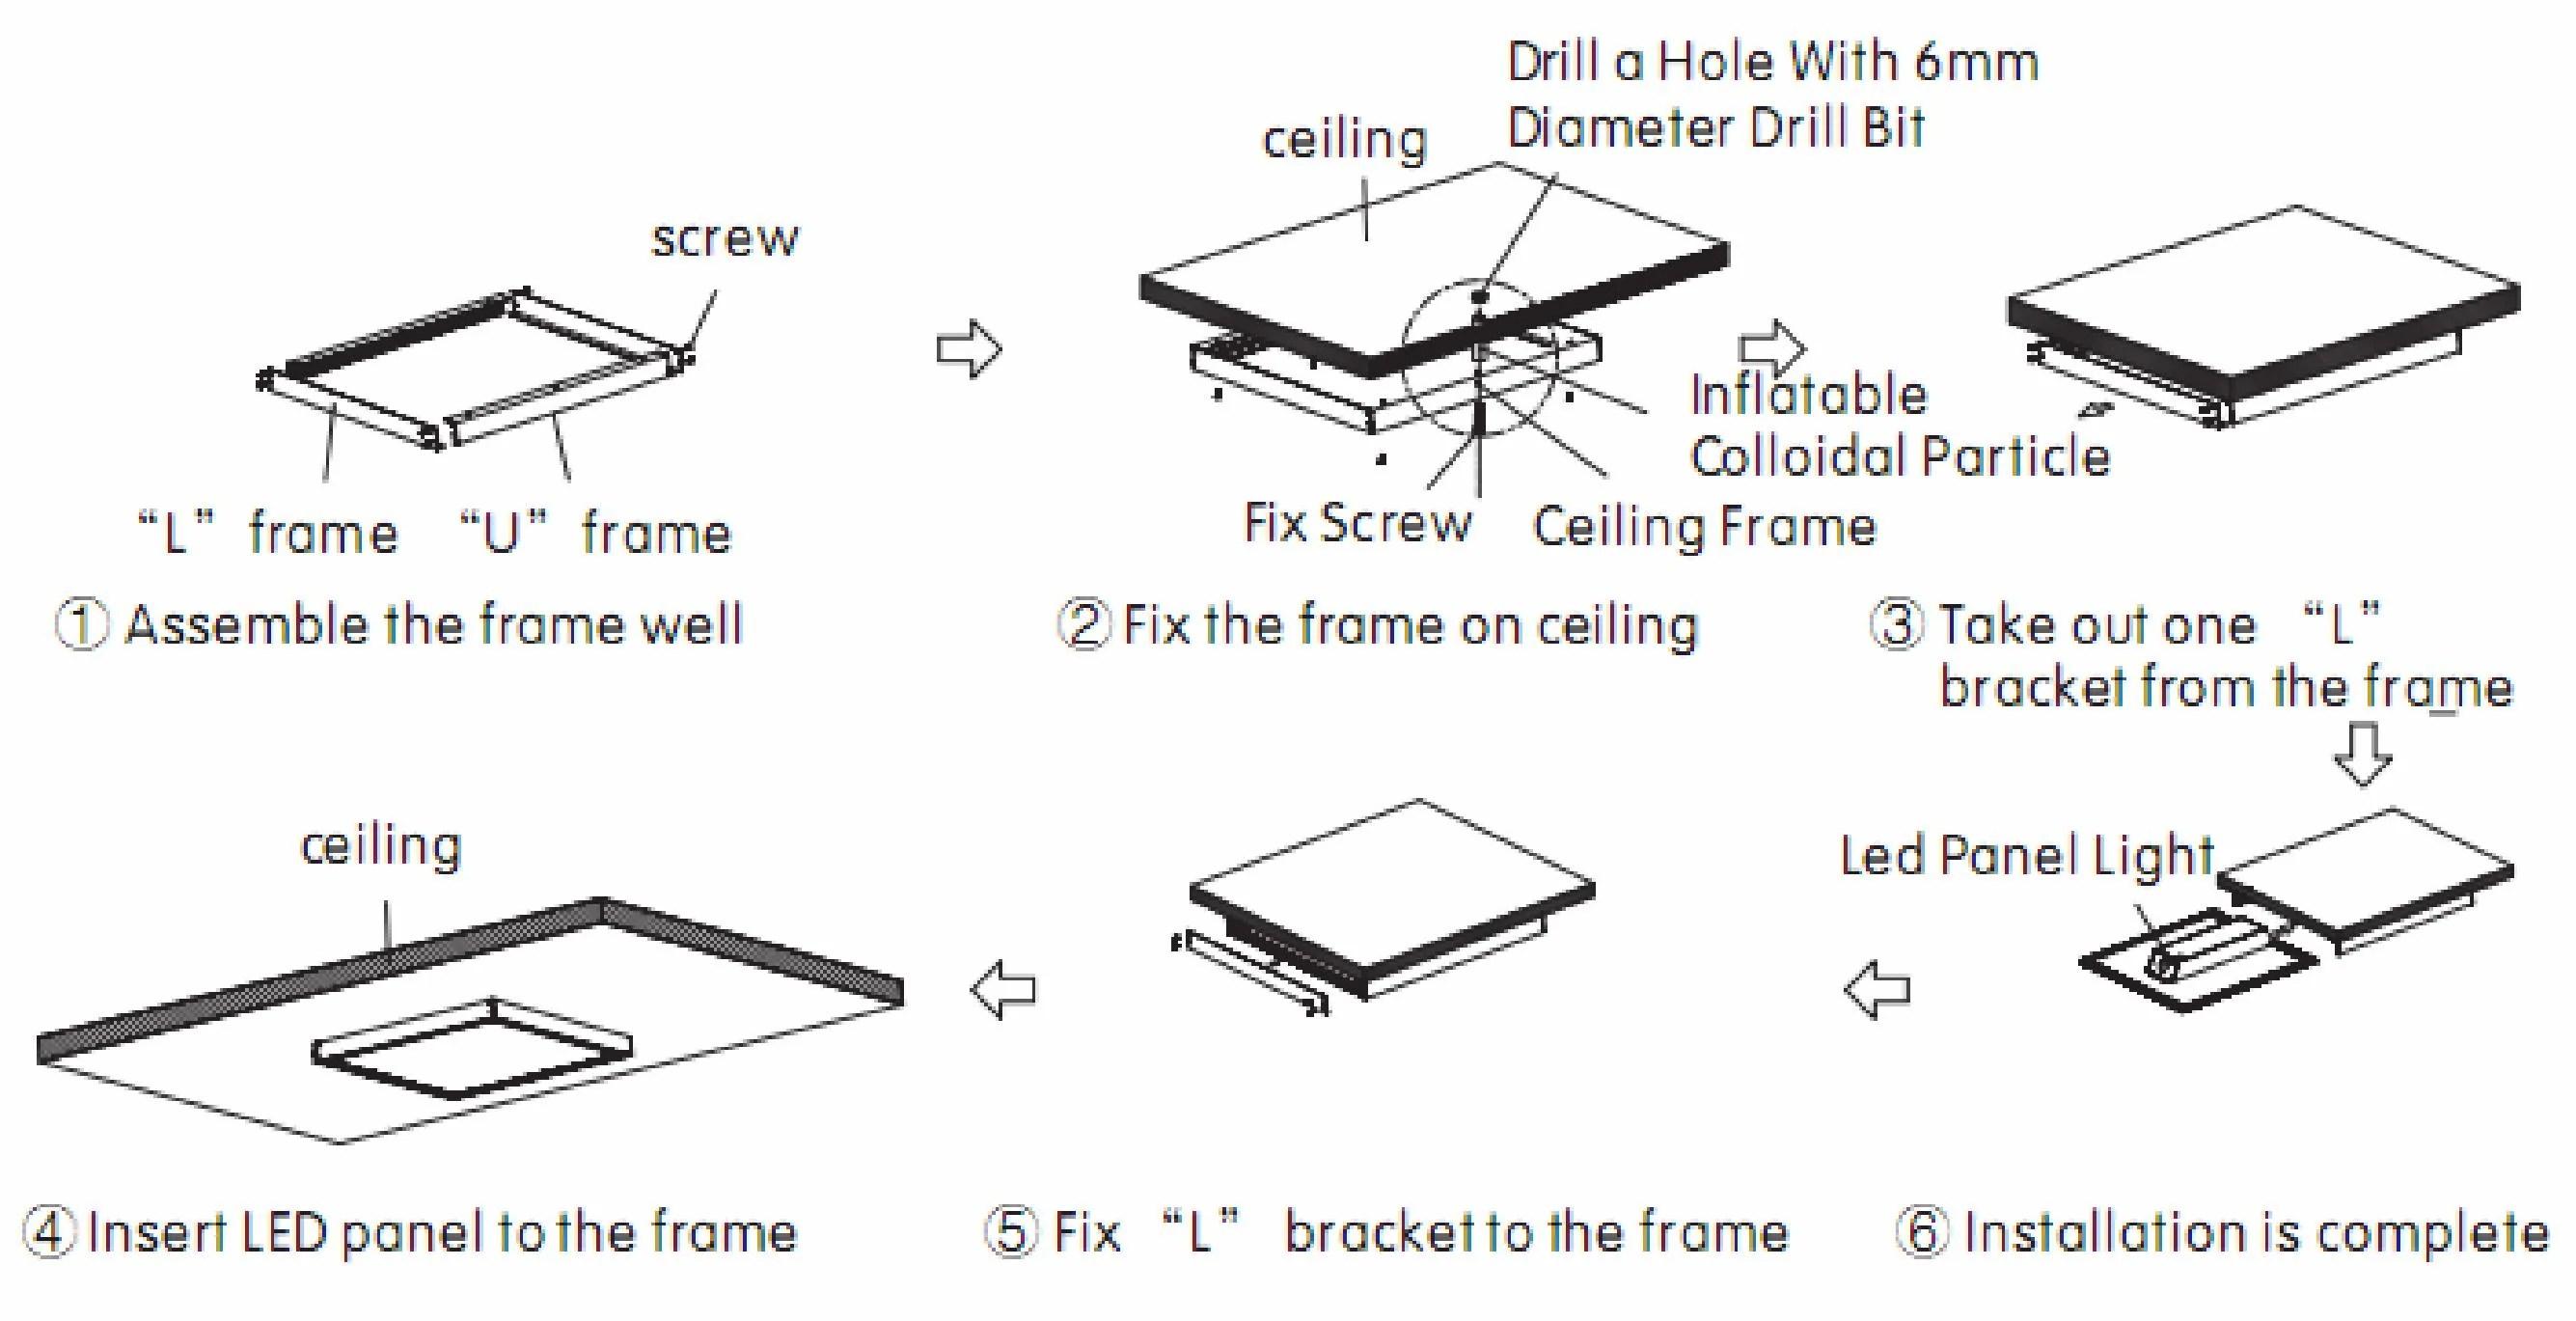 hight resolution of led panel diagram data wiring diagramsled panel diagram schema wiring diagram led photocell diagram led panel